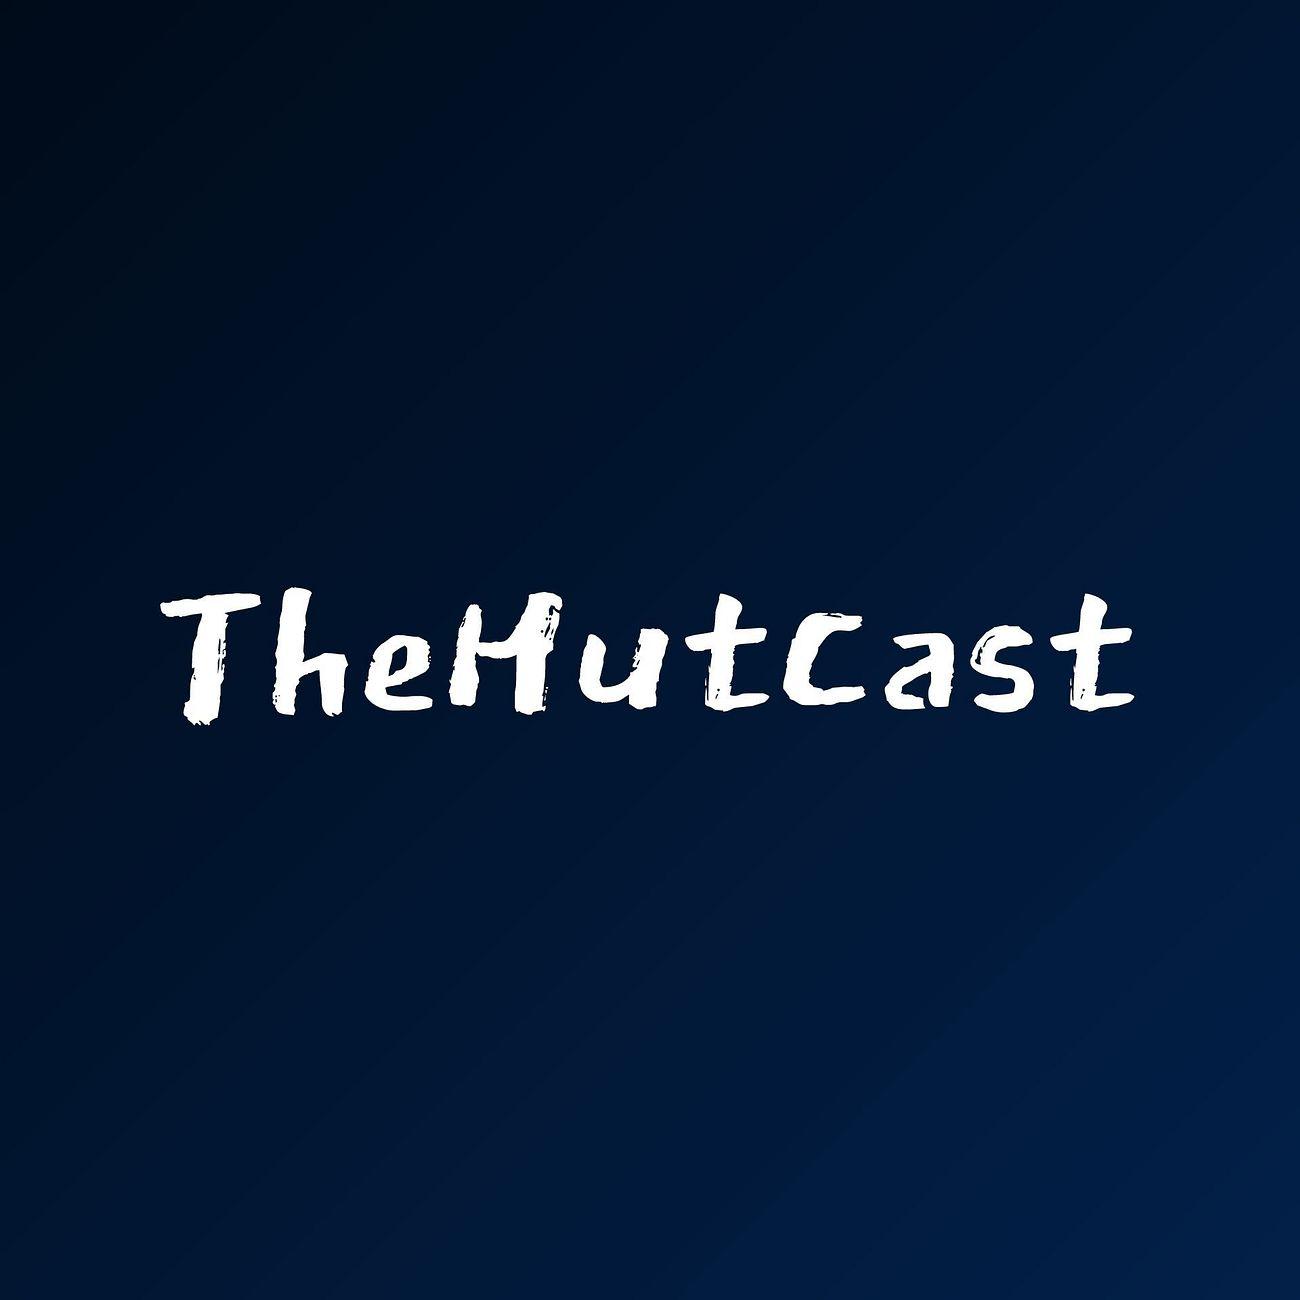 TheHutCast